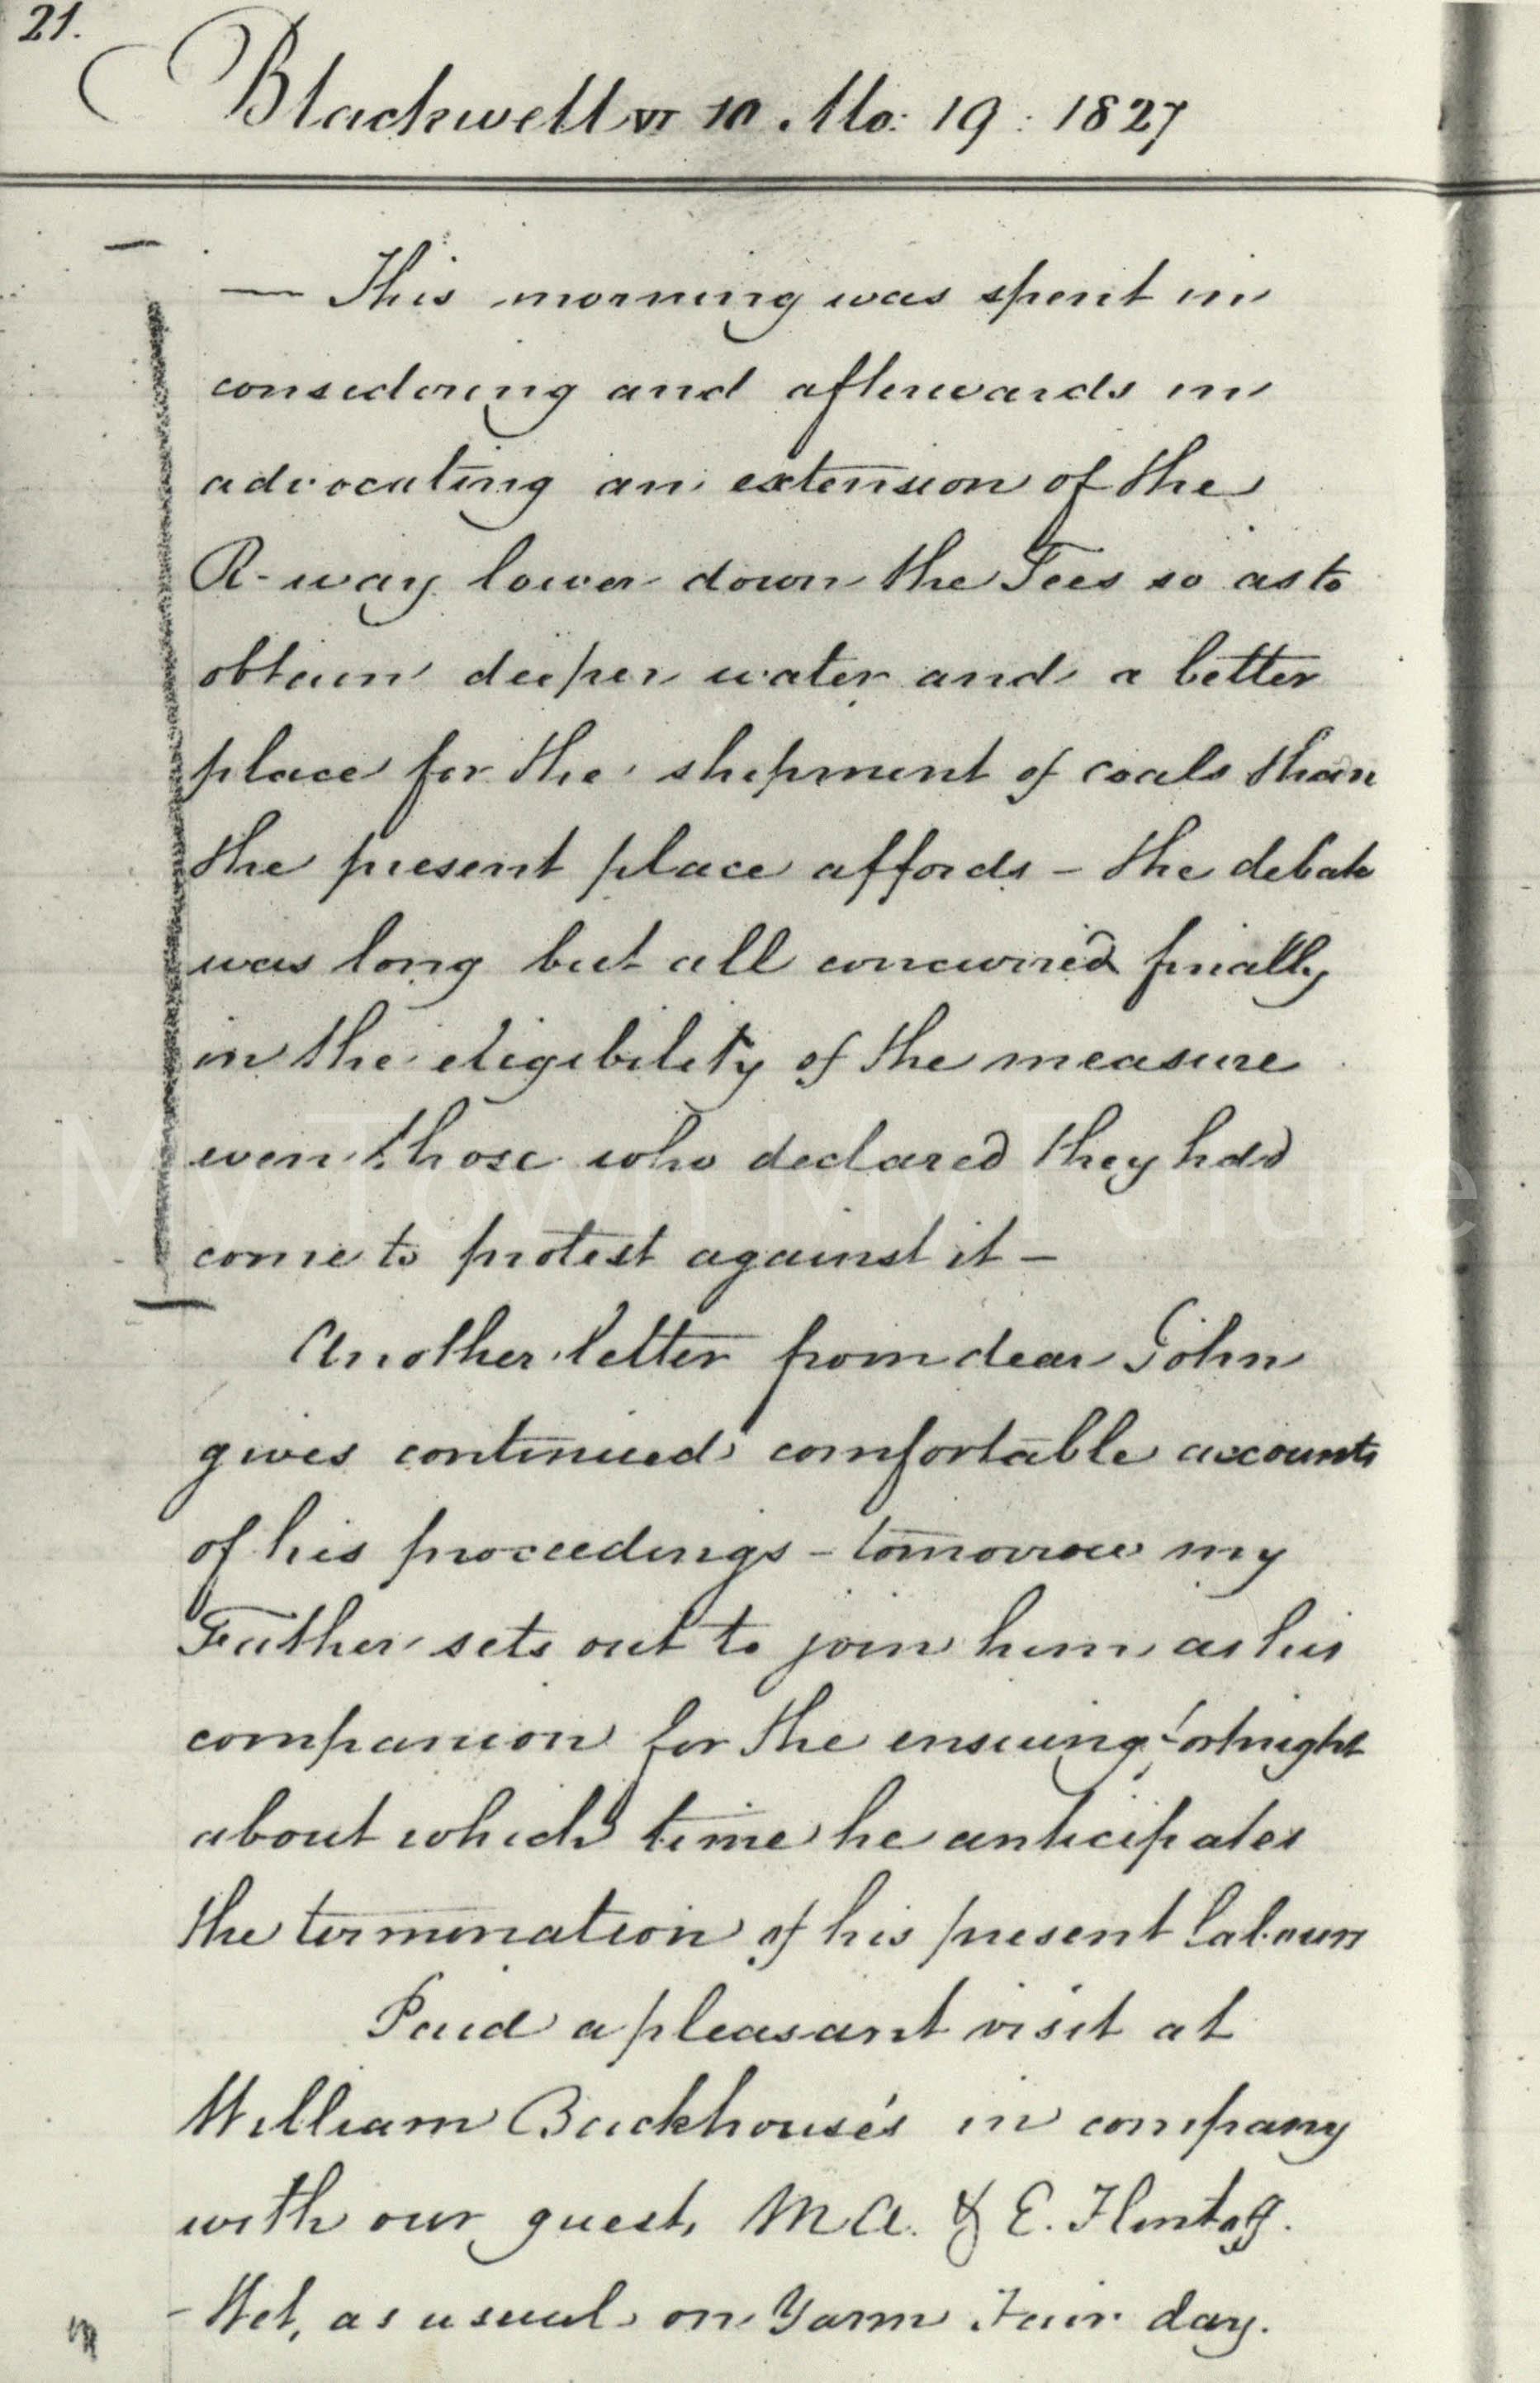 Joseph Pease Document, 1827